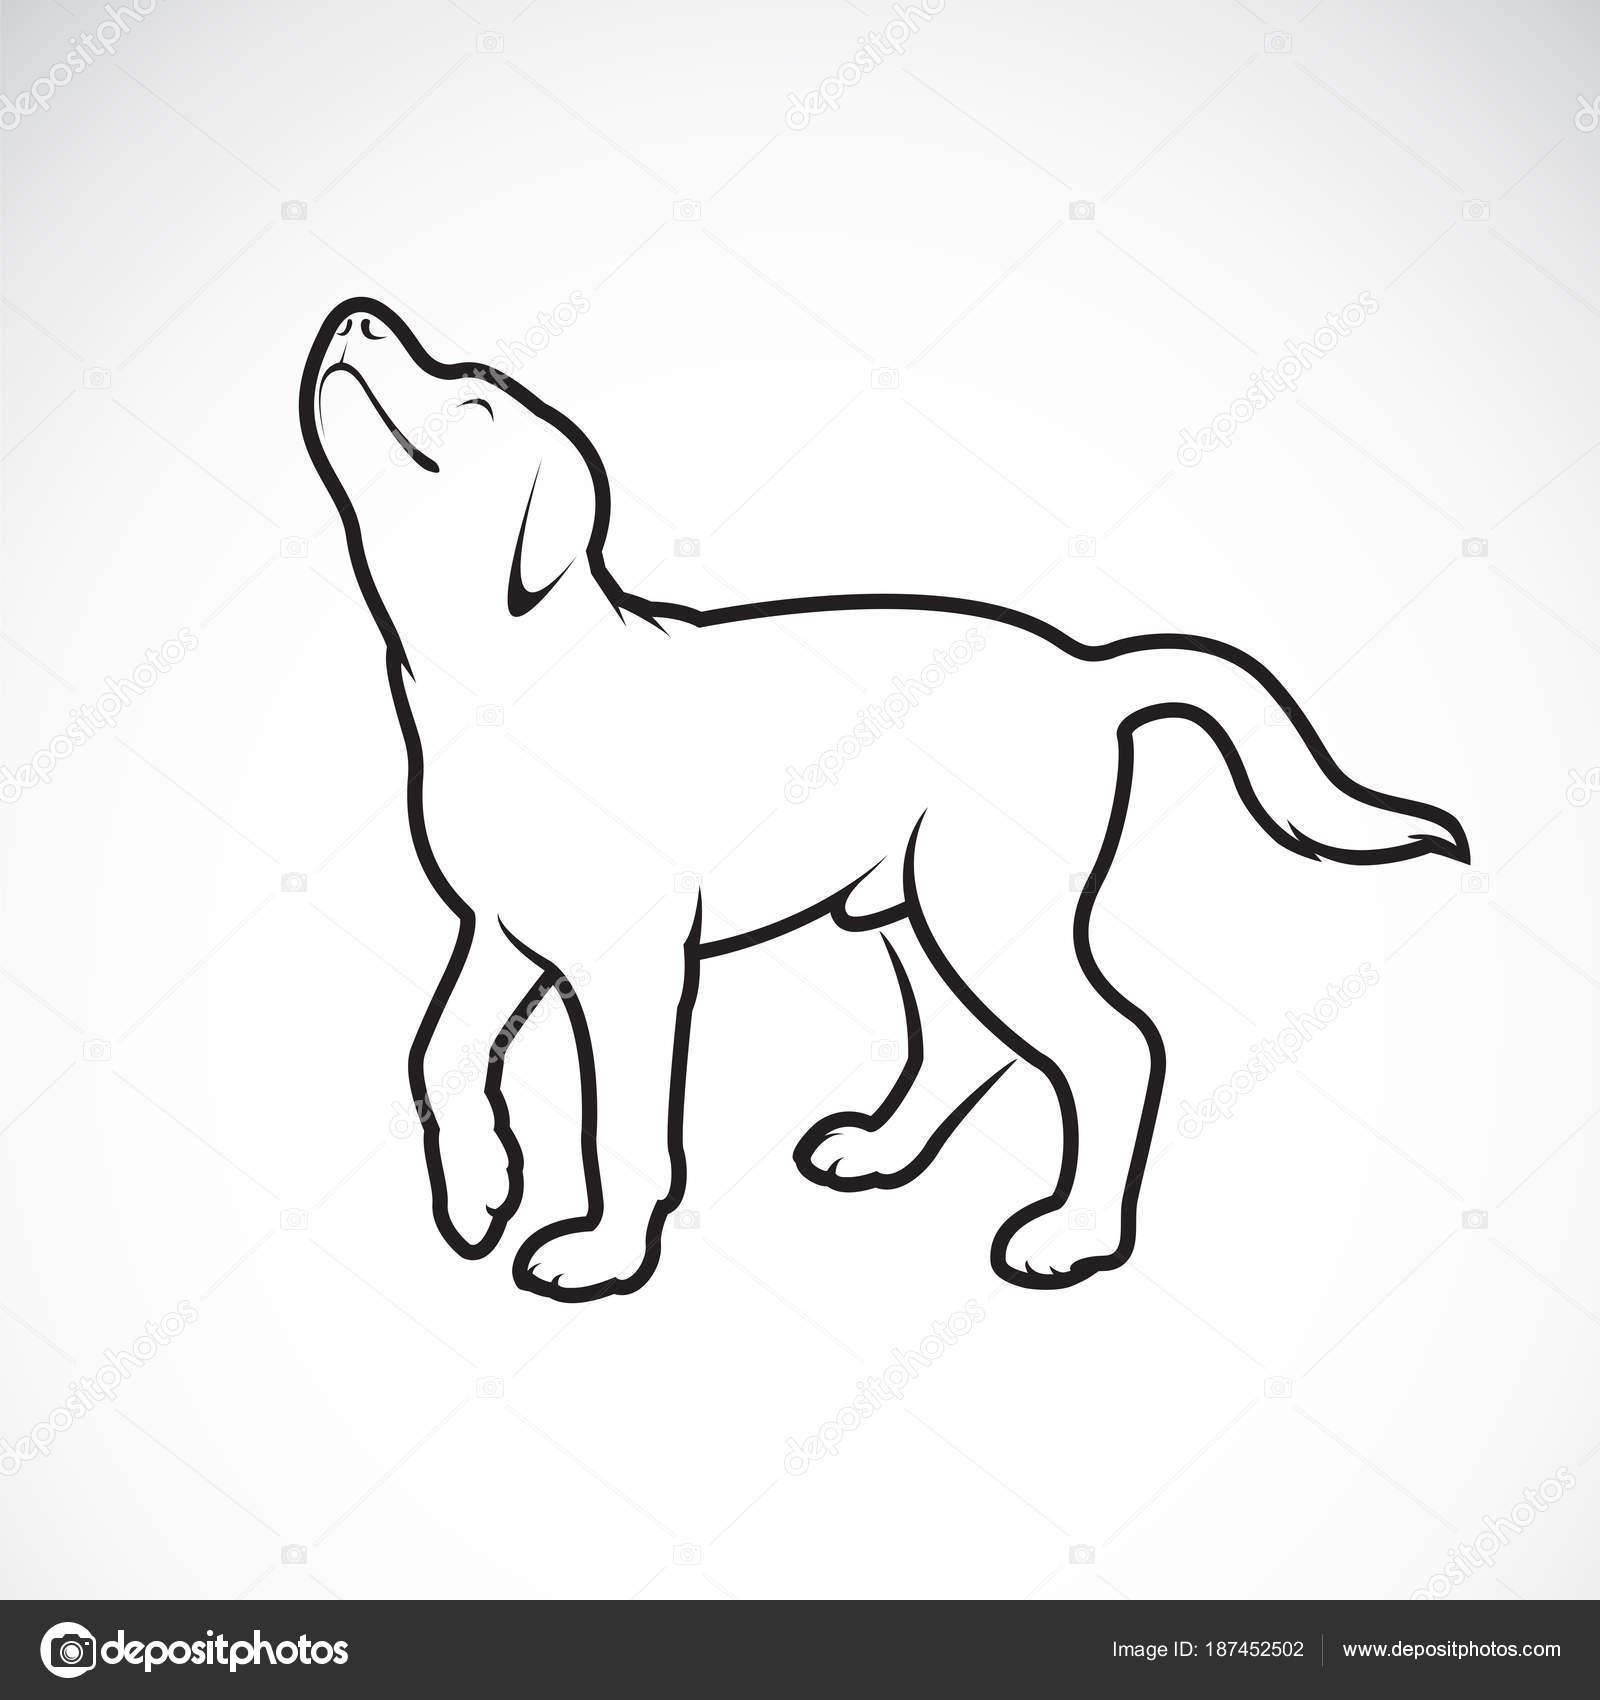 Dibujos Palomas Blancas Faciles Vector De Un Labrador De Perro